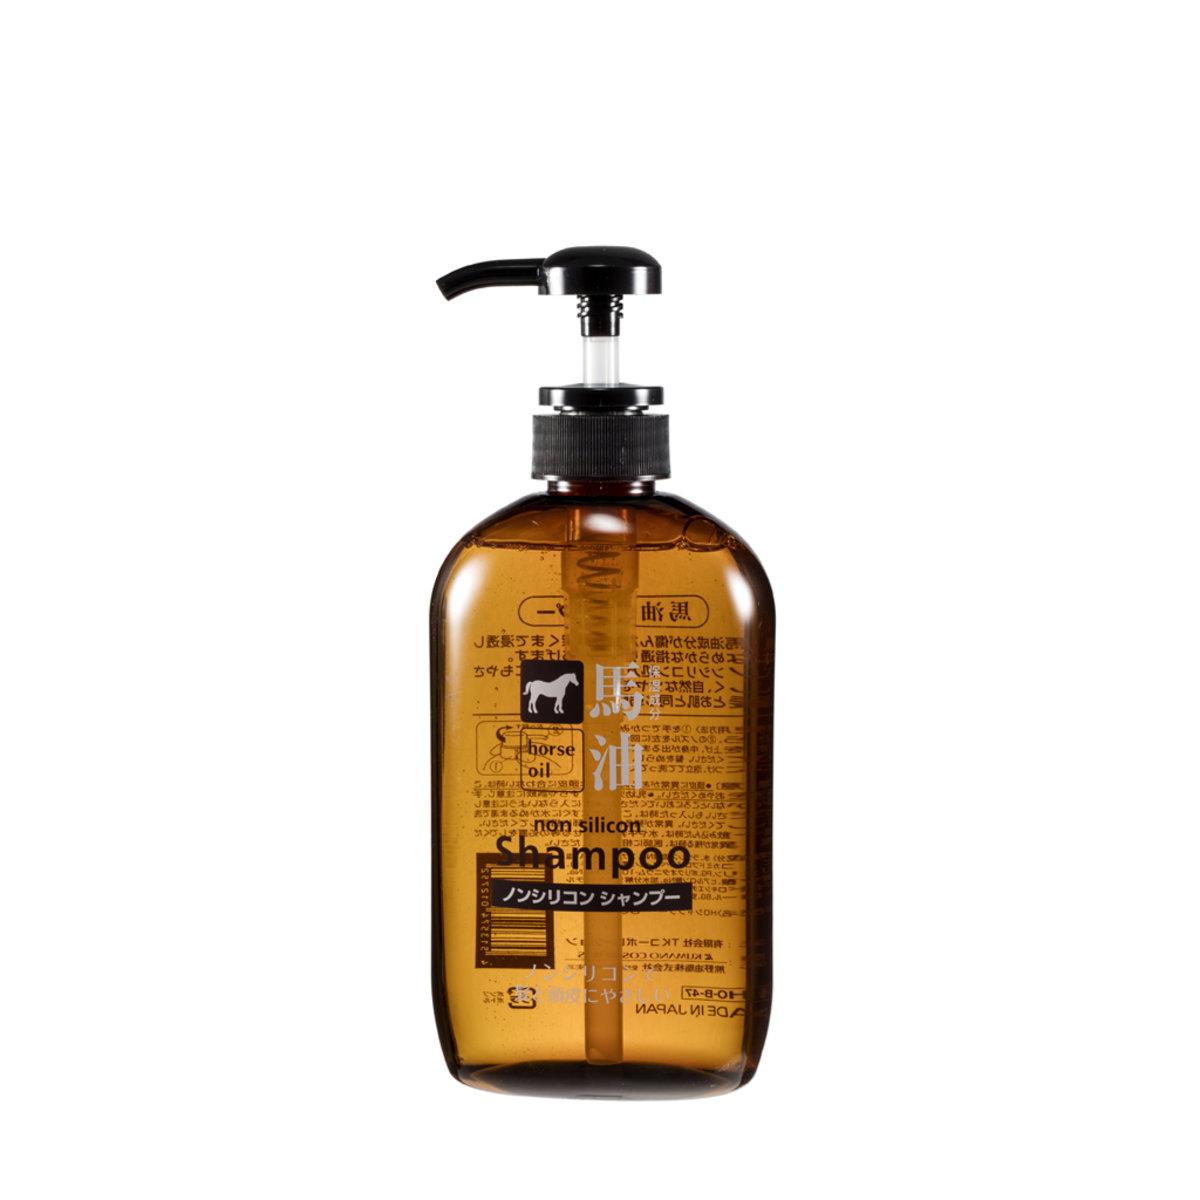 Horse Oil Silicone Free Shampoo (600ml)